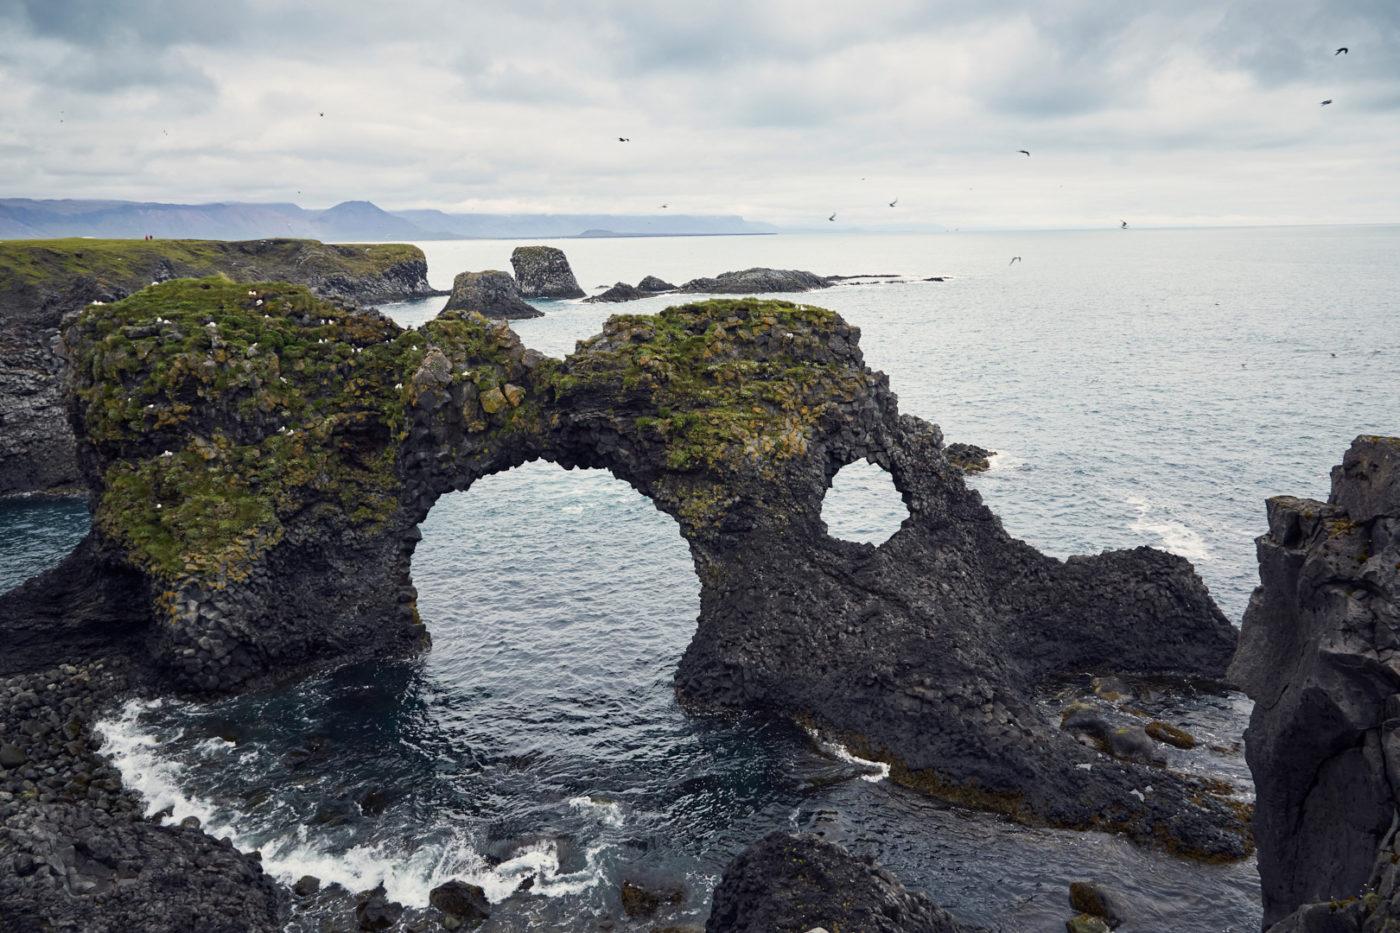 Arnastapi, coastline, coast, Küste, Küstenlinie, Snaeffelsnes, Island, Iceland, Rundreise, Reiseblogger, Miles and Shores